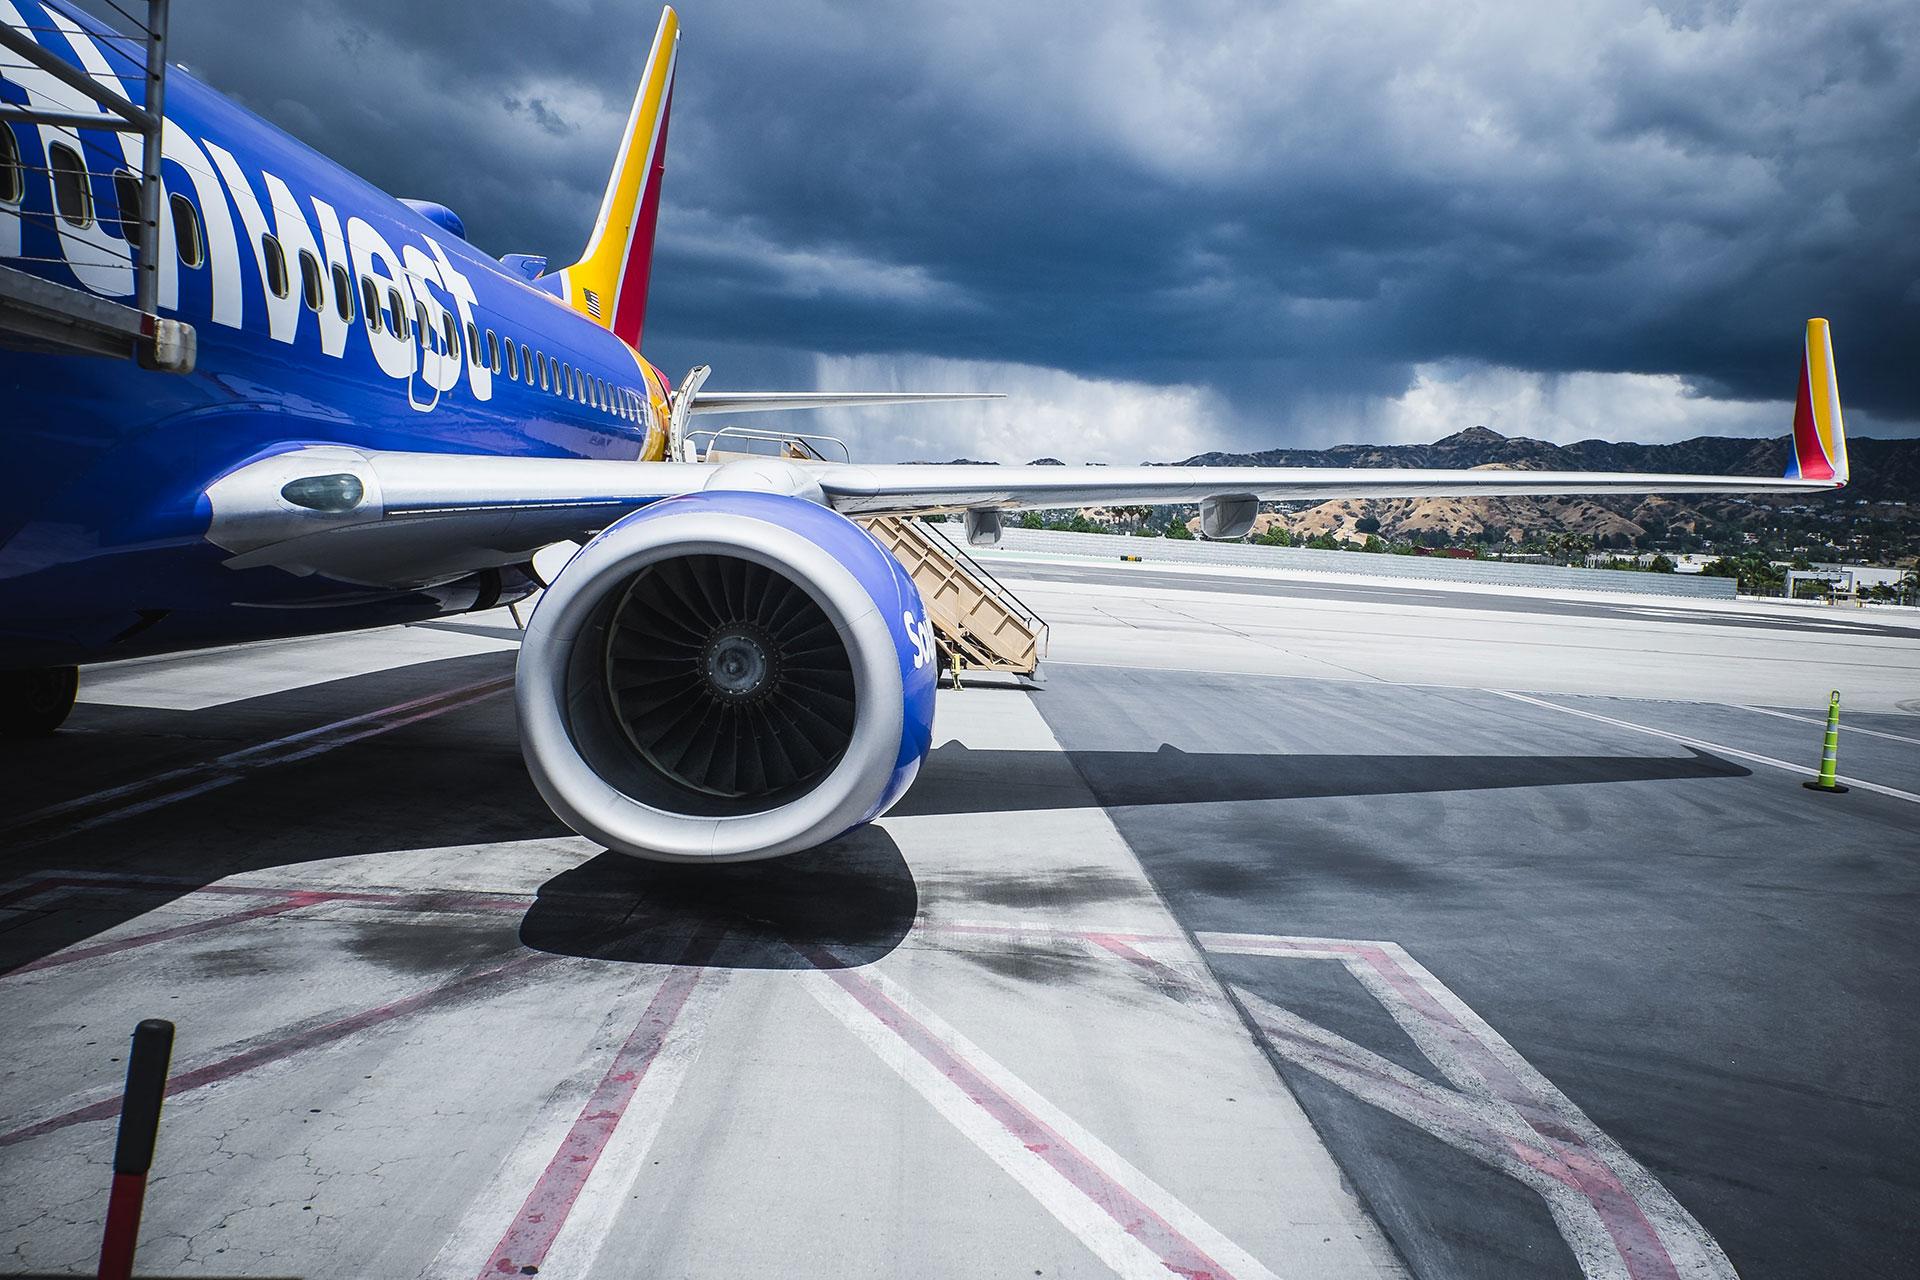 Southwest Airlines Flight tracker